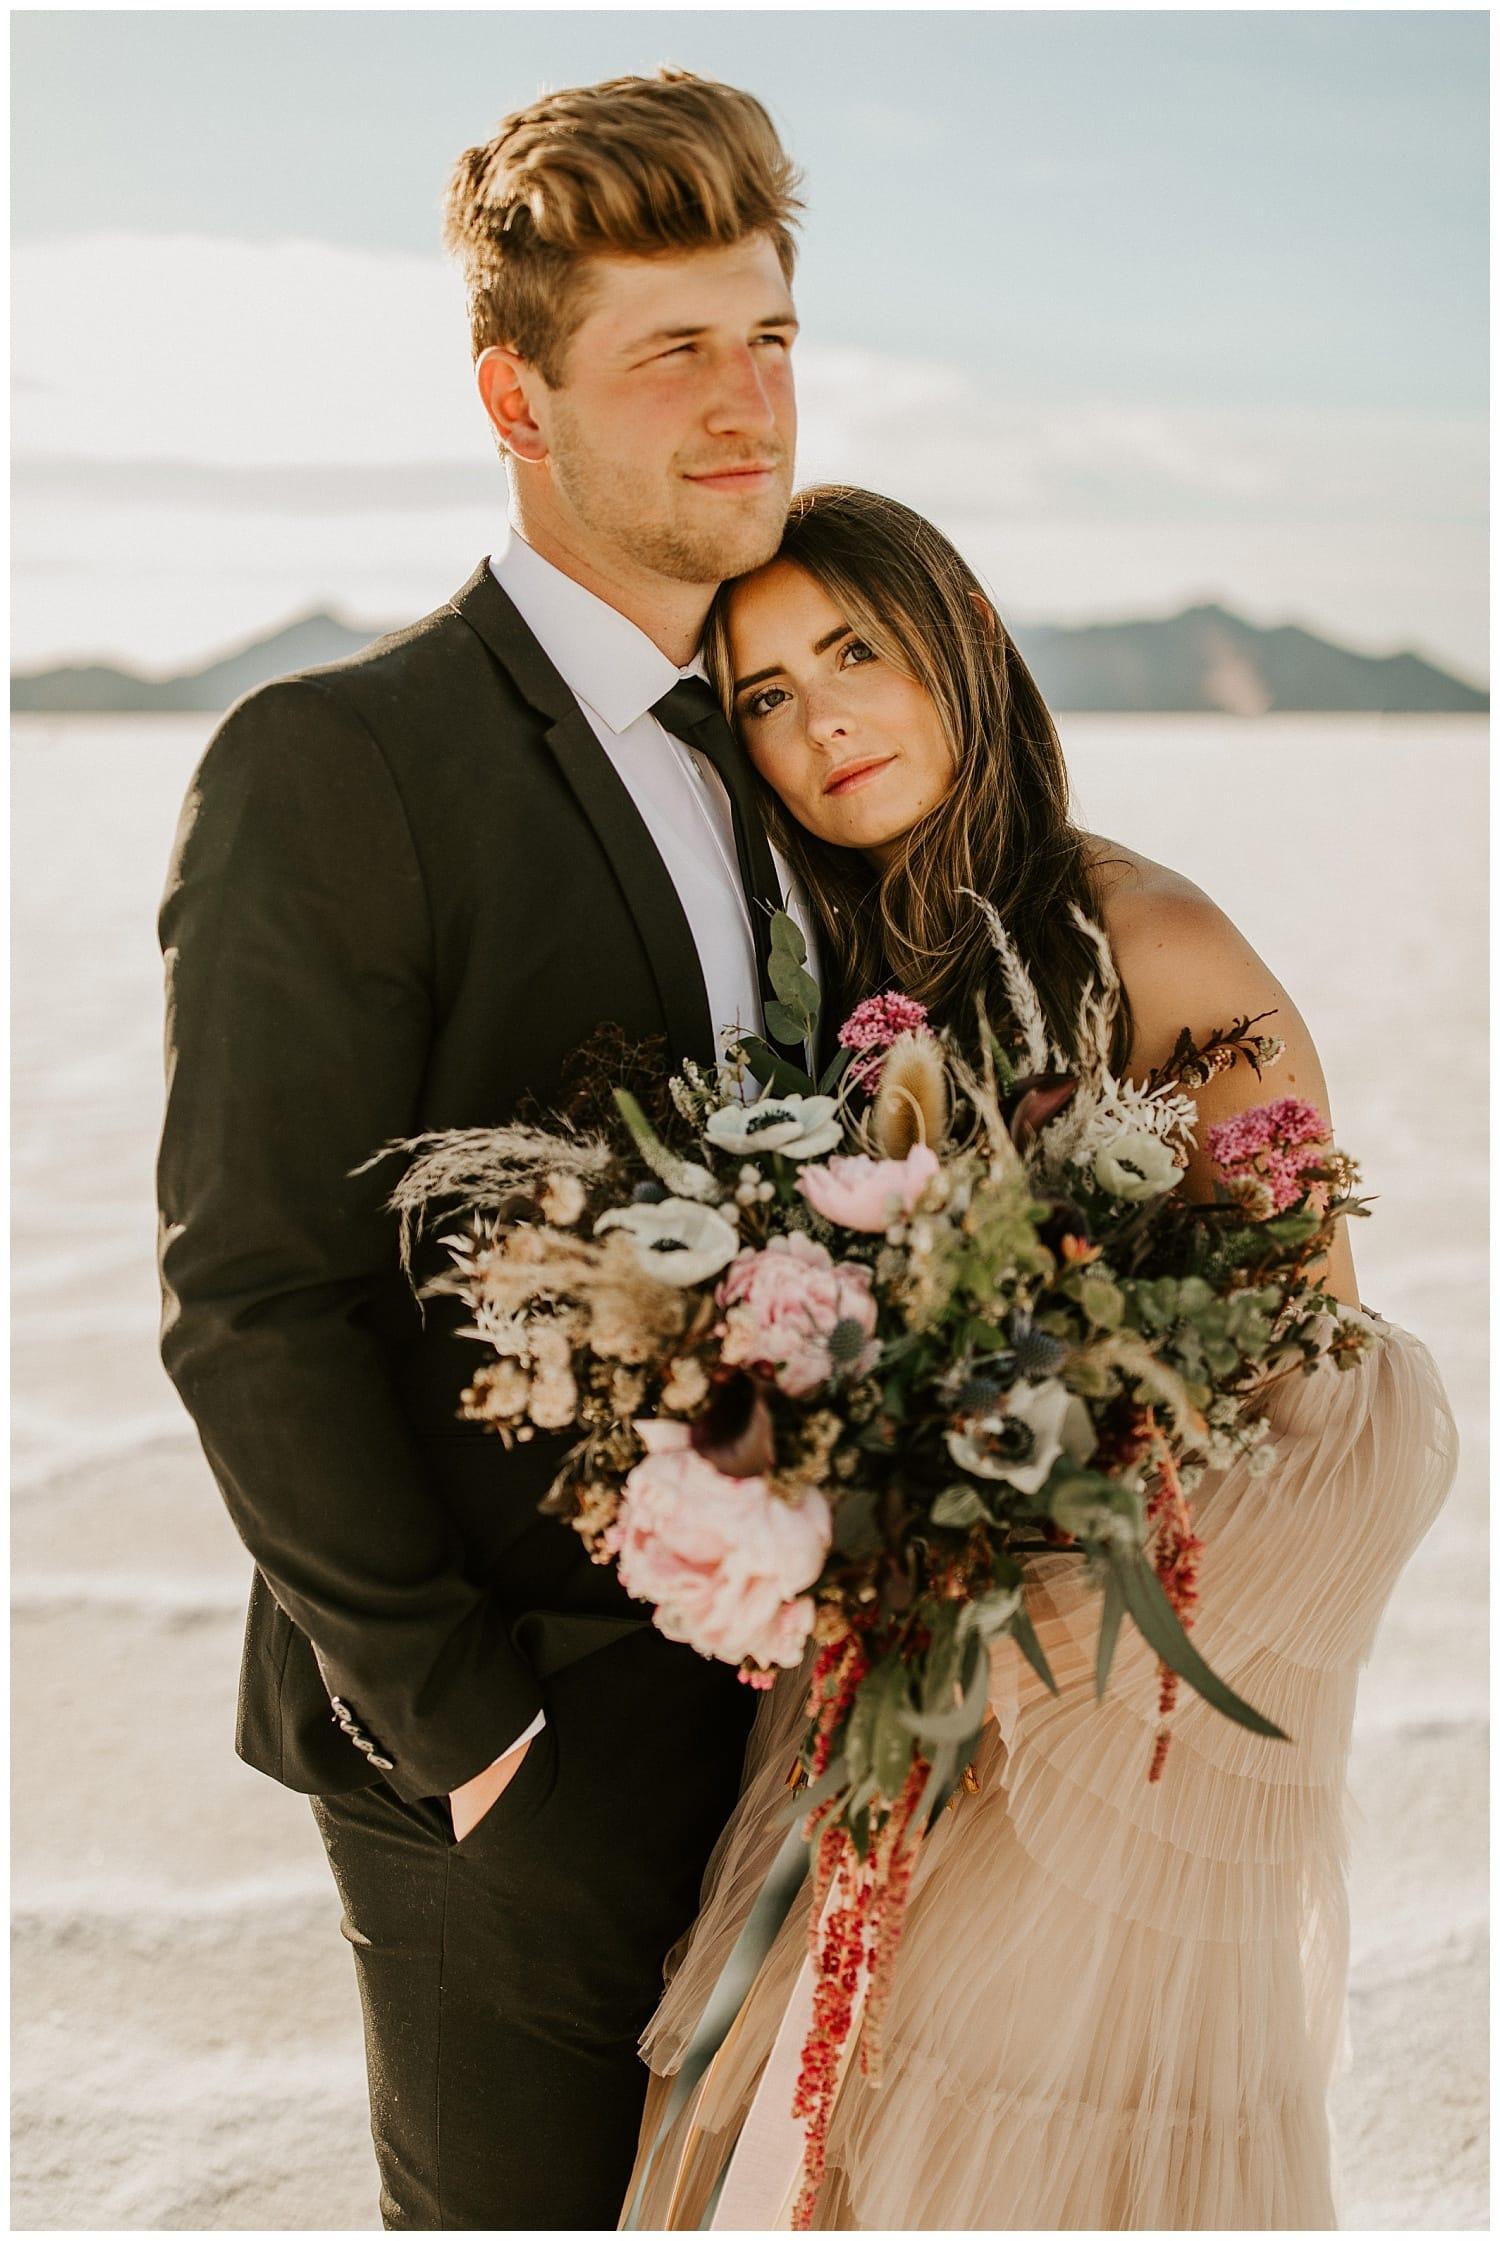 bonneville salt flats elopement, salt flats photography, utah wedding photographers